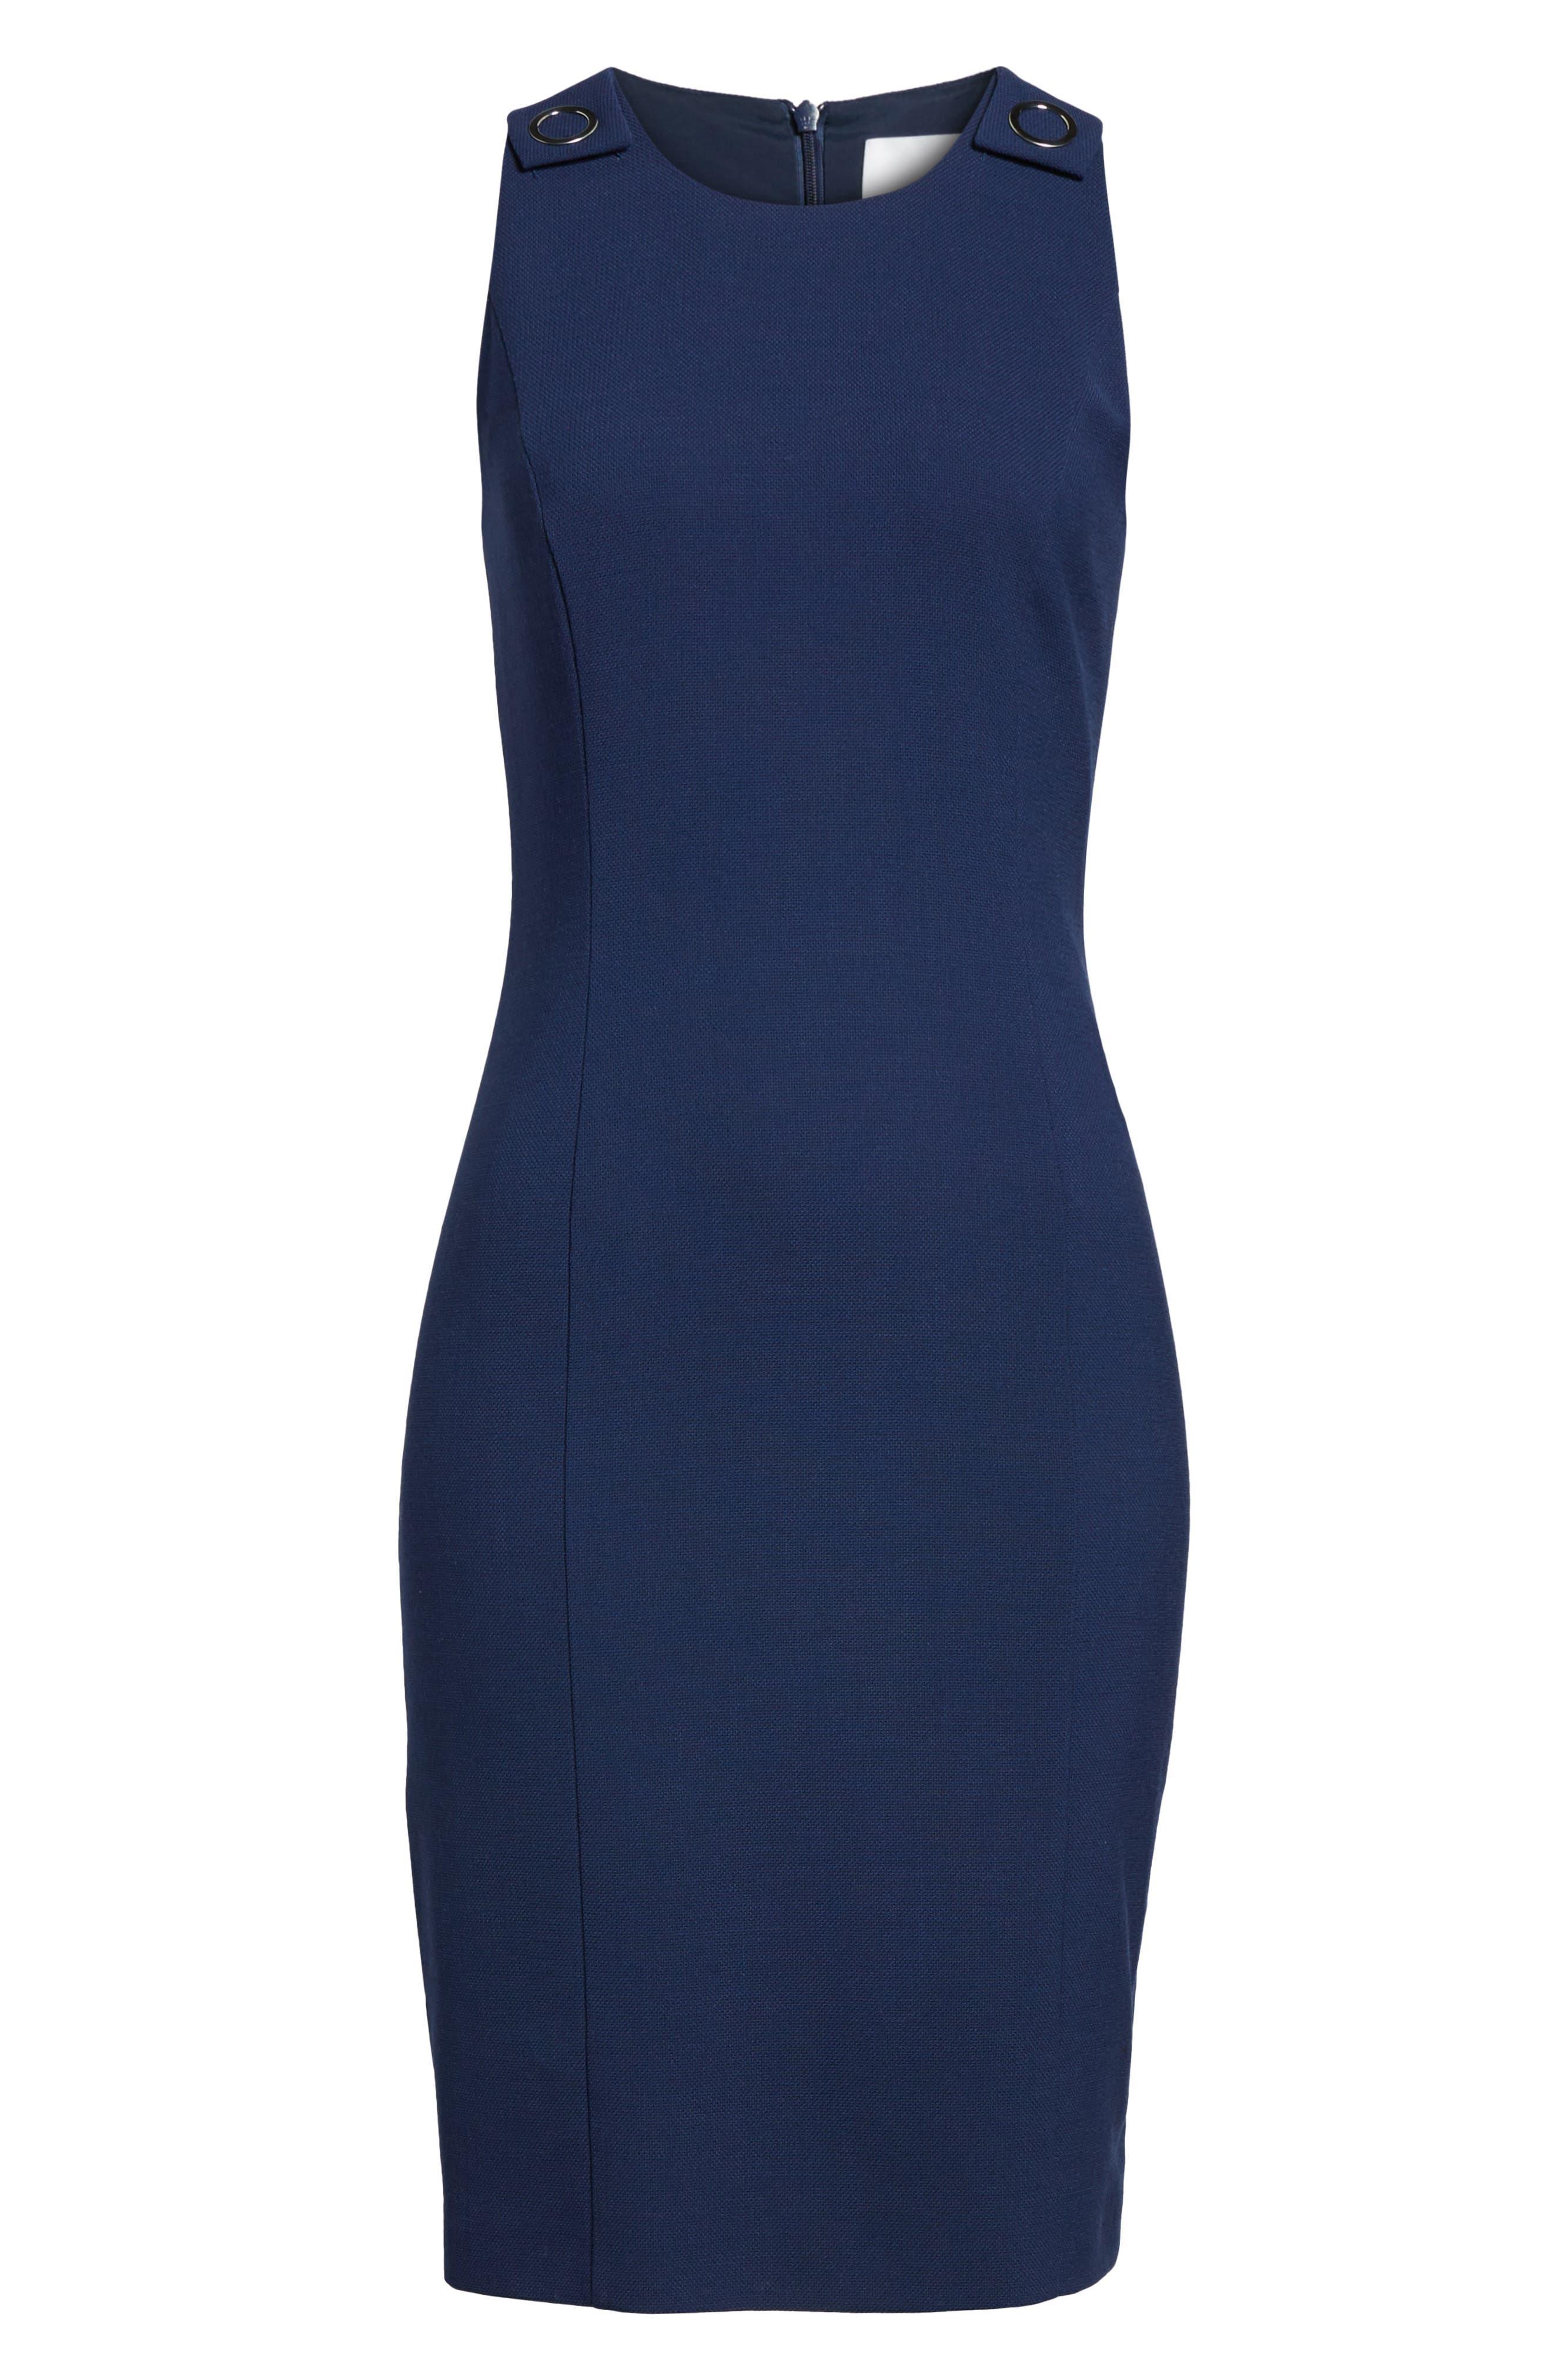 Dibalena Texture Stretch Dress,                             Alternate thumbnail 6, color,                             425